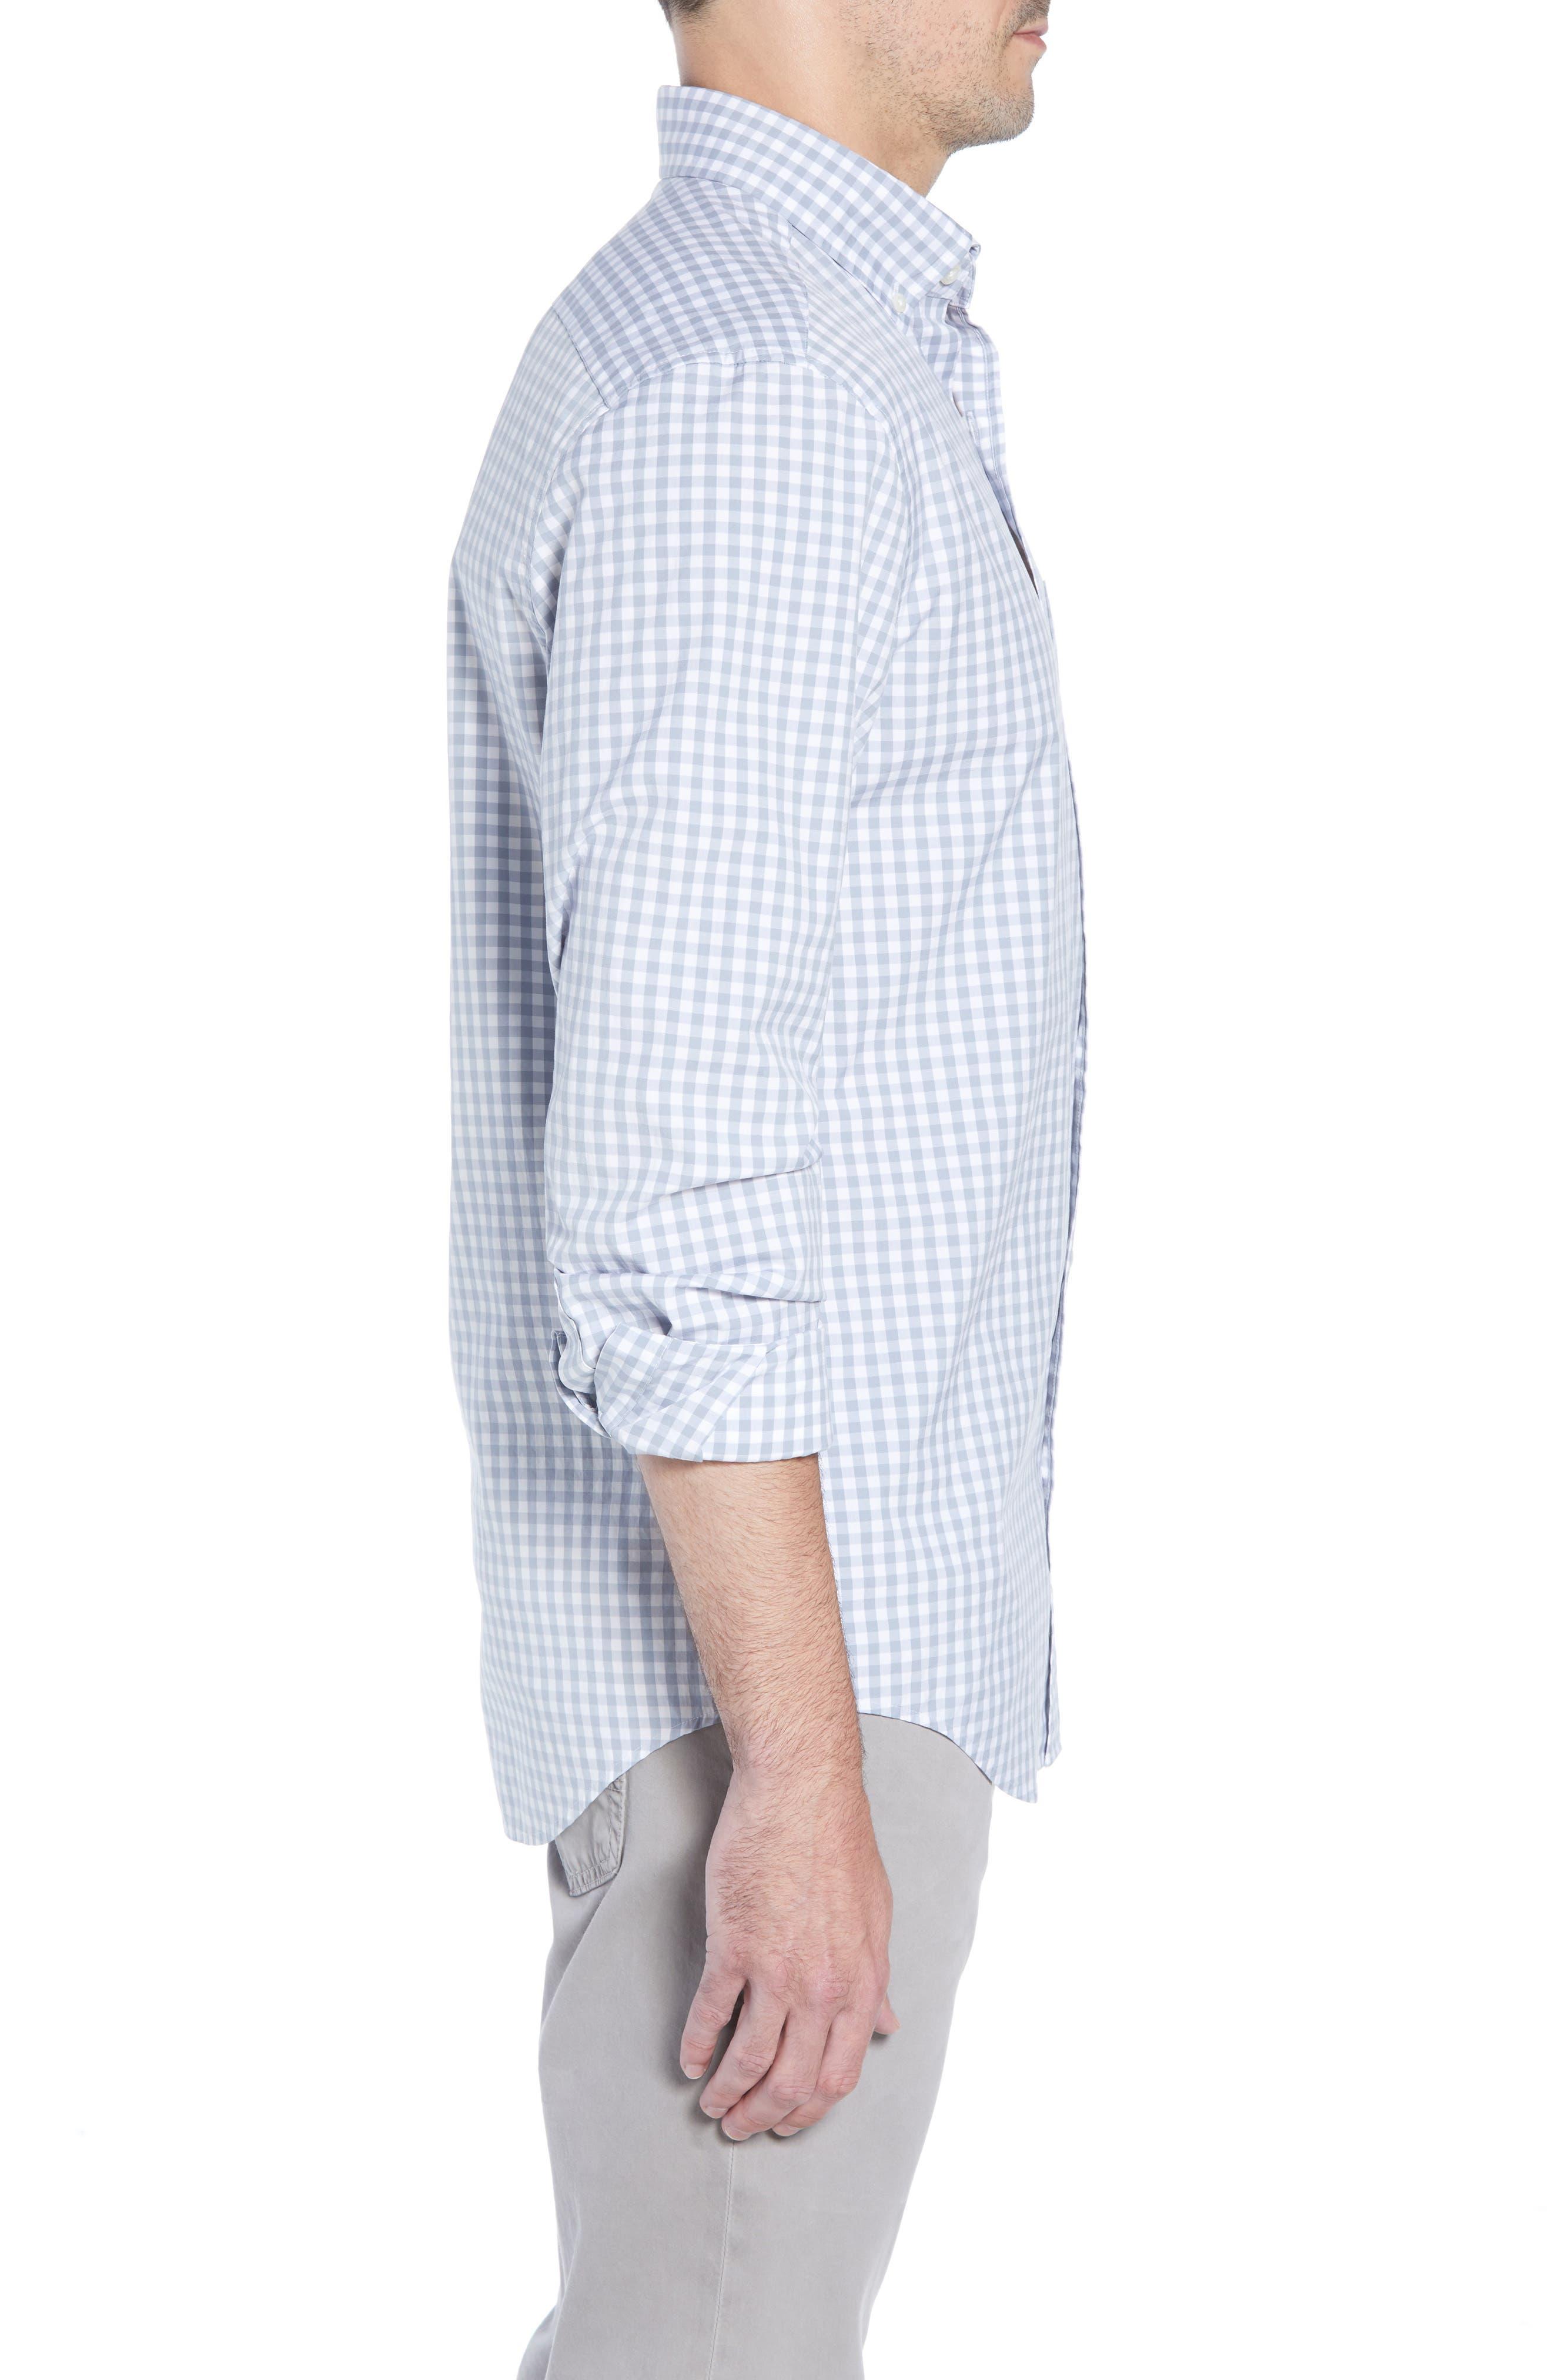 VINEYARD VINES, Carleton Classic Fit Gingham Buttondown Shirt, Alternate thumbnail 4, color, 023